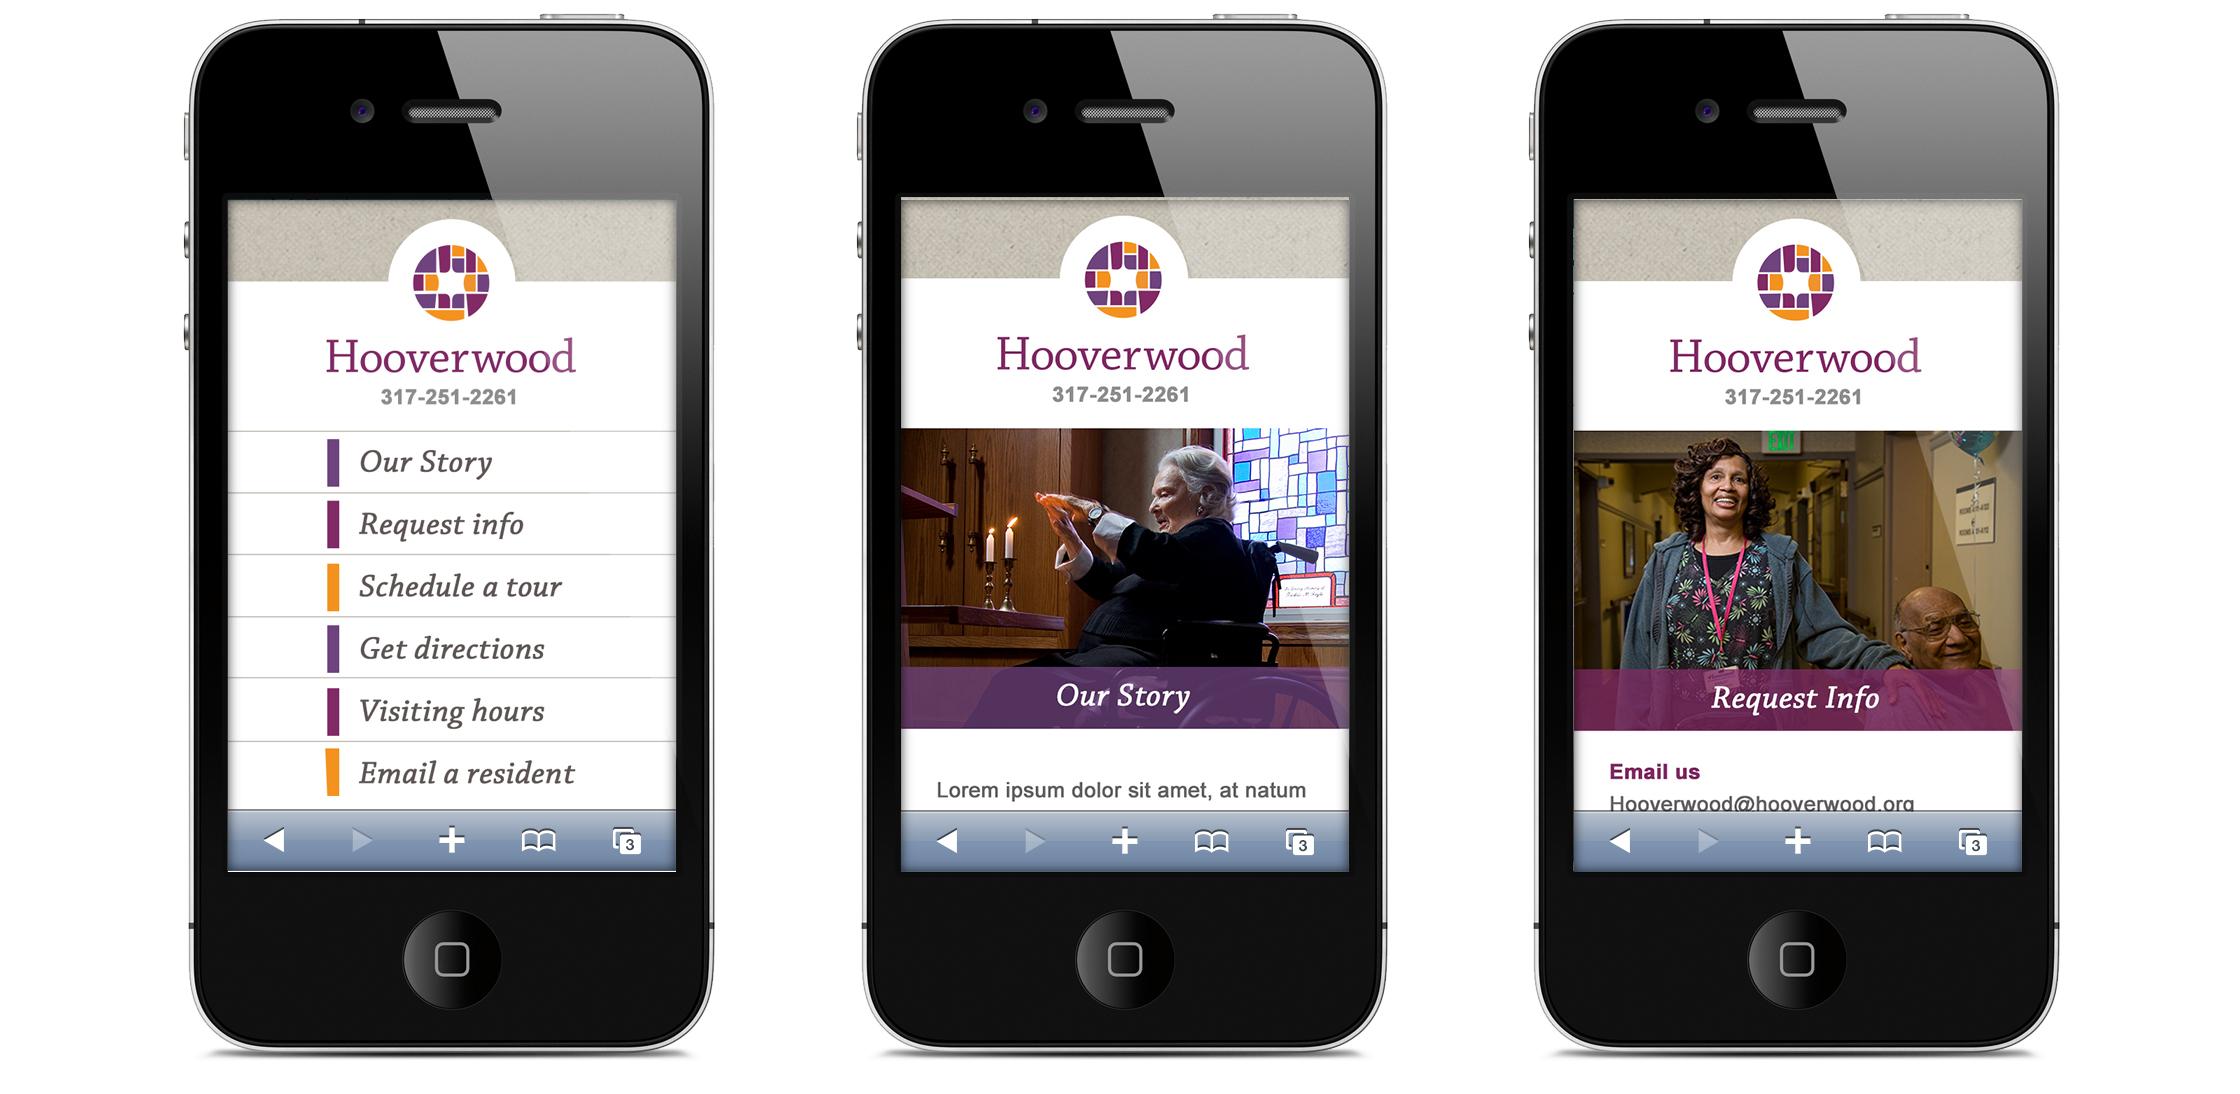 Hooverwood Mobile Website